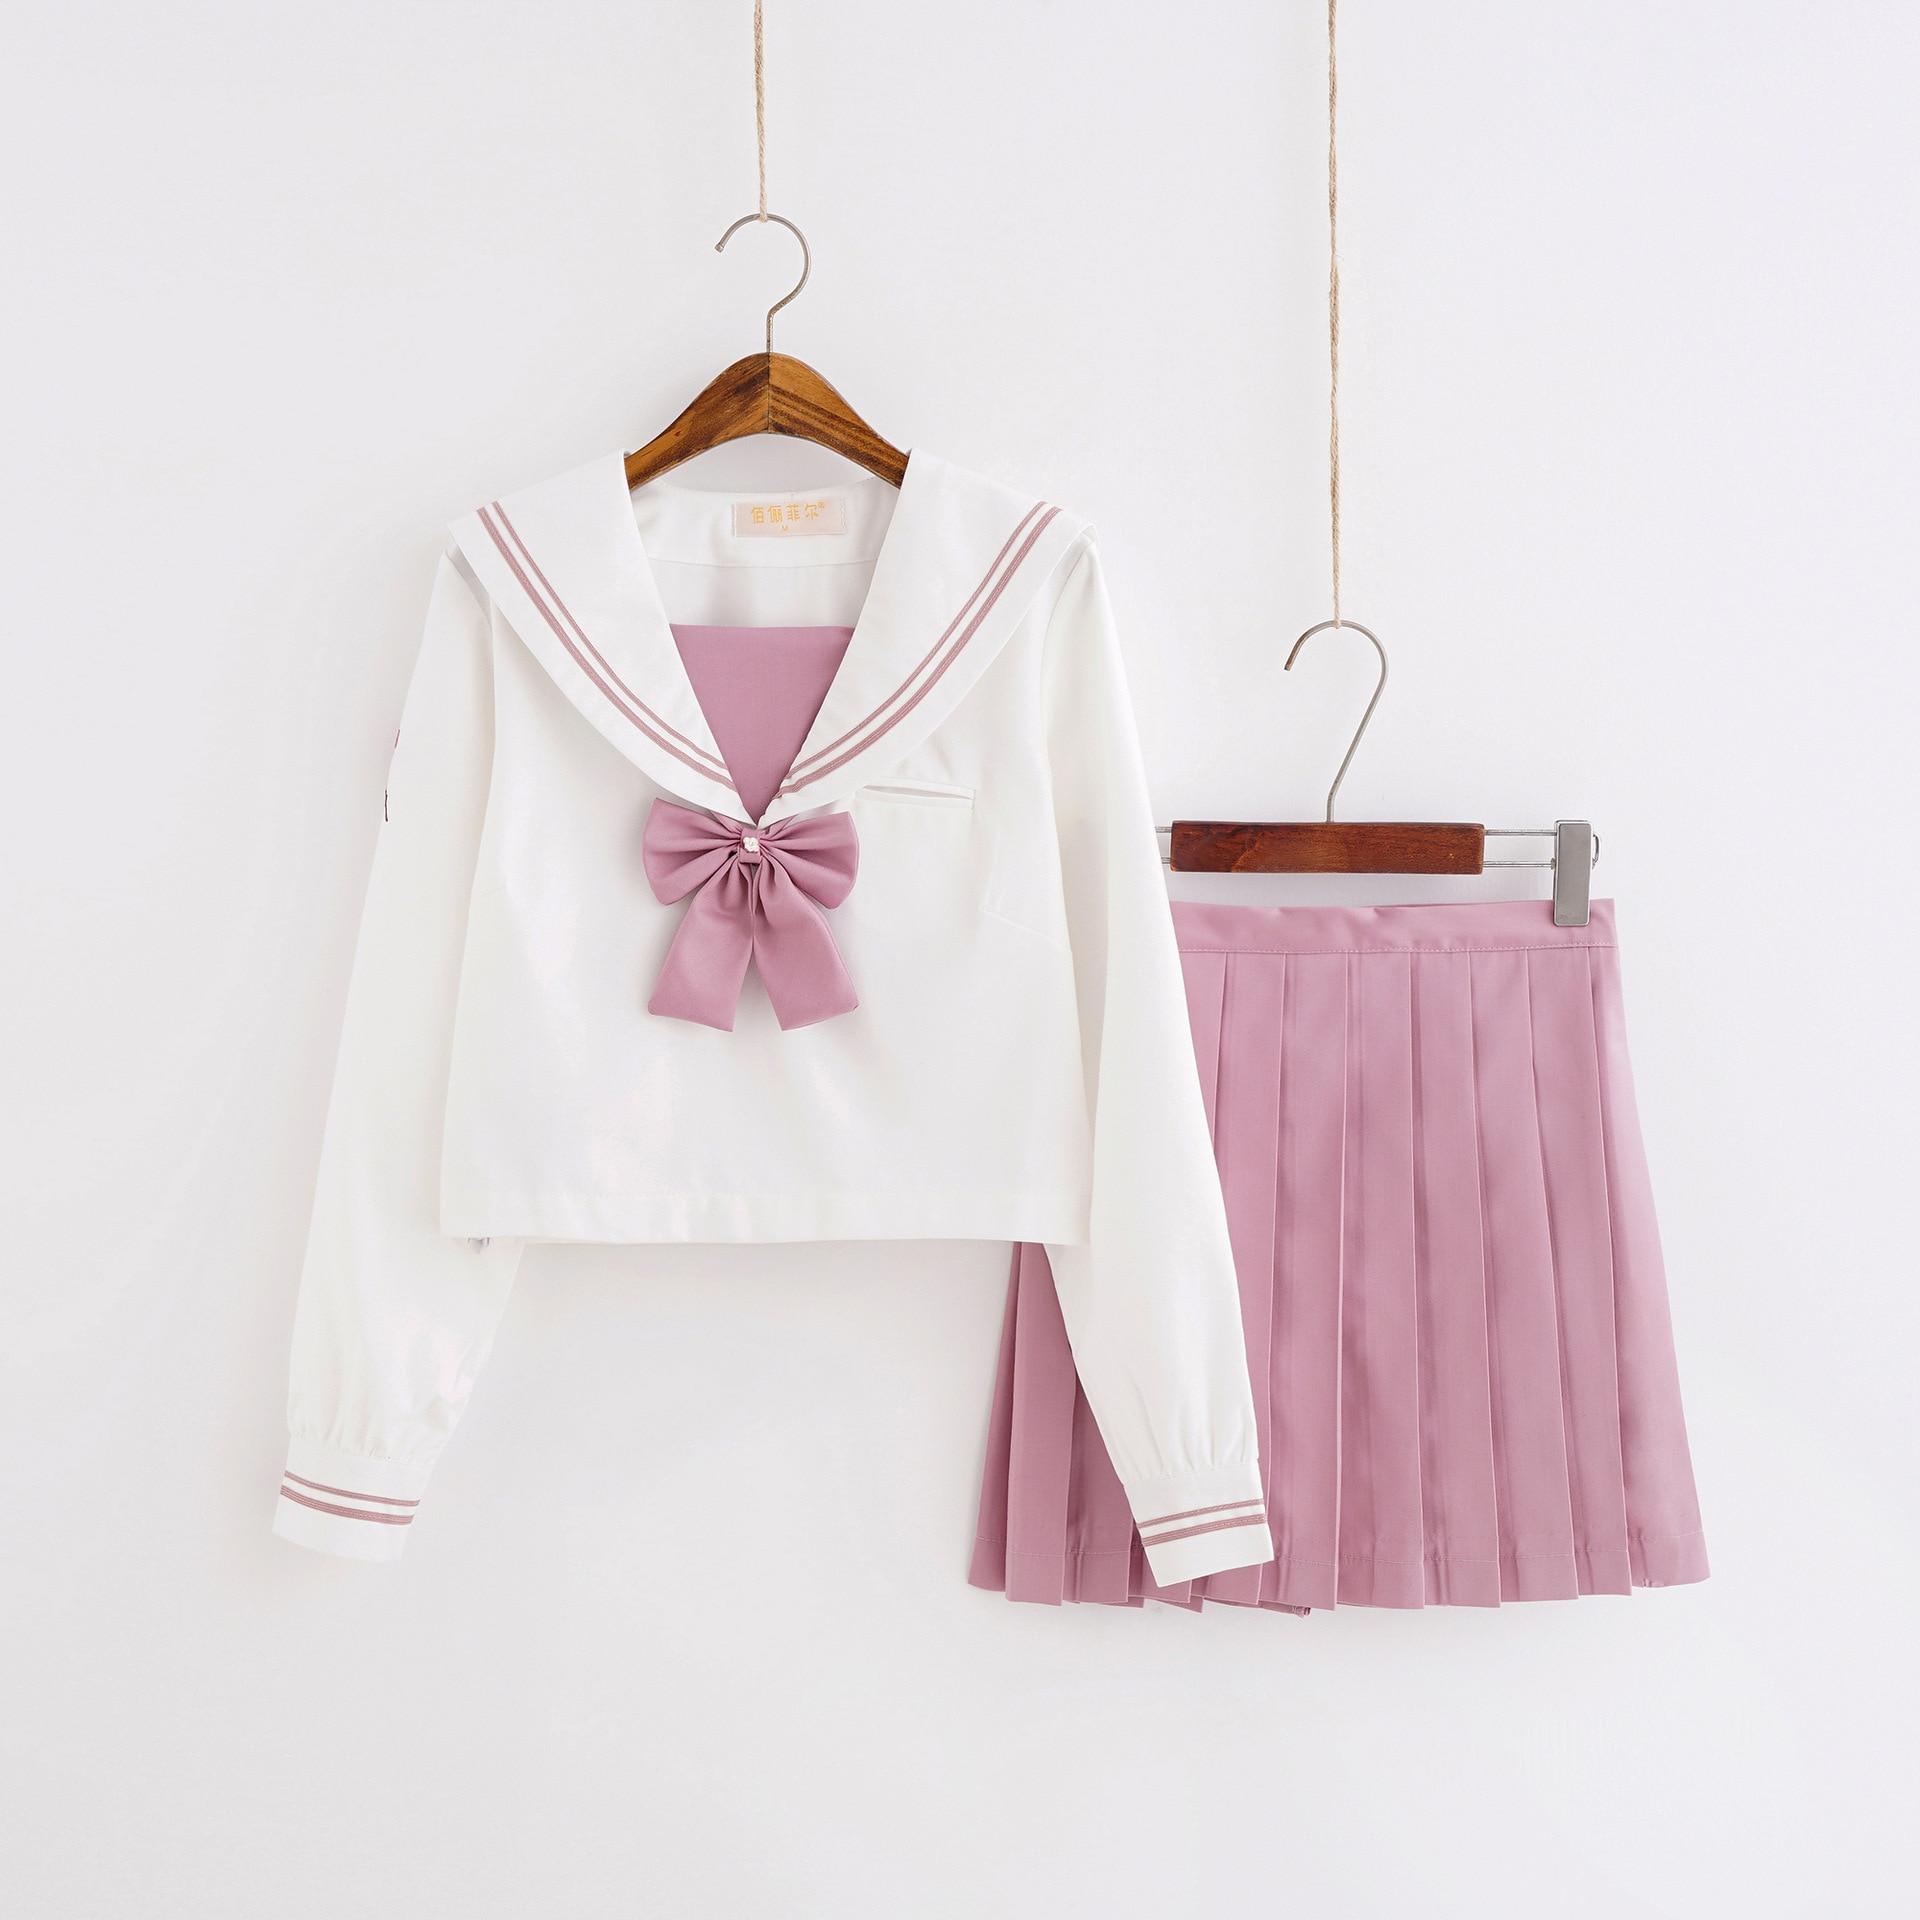 school uniform outfit white short sleeve top and pink skirt School Uniform Outfit White Long Sleeve Shirt and Pleated  Pink Skirt